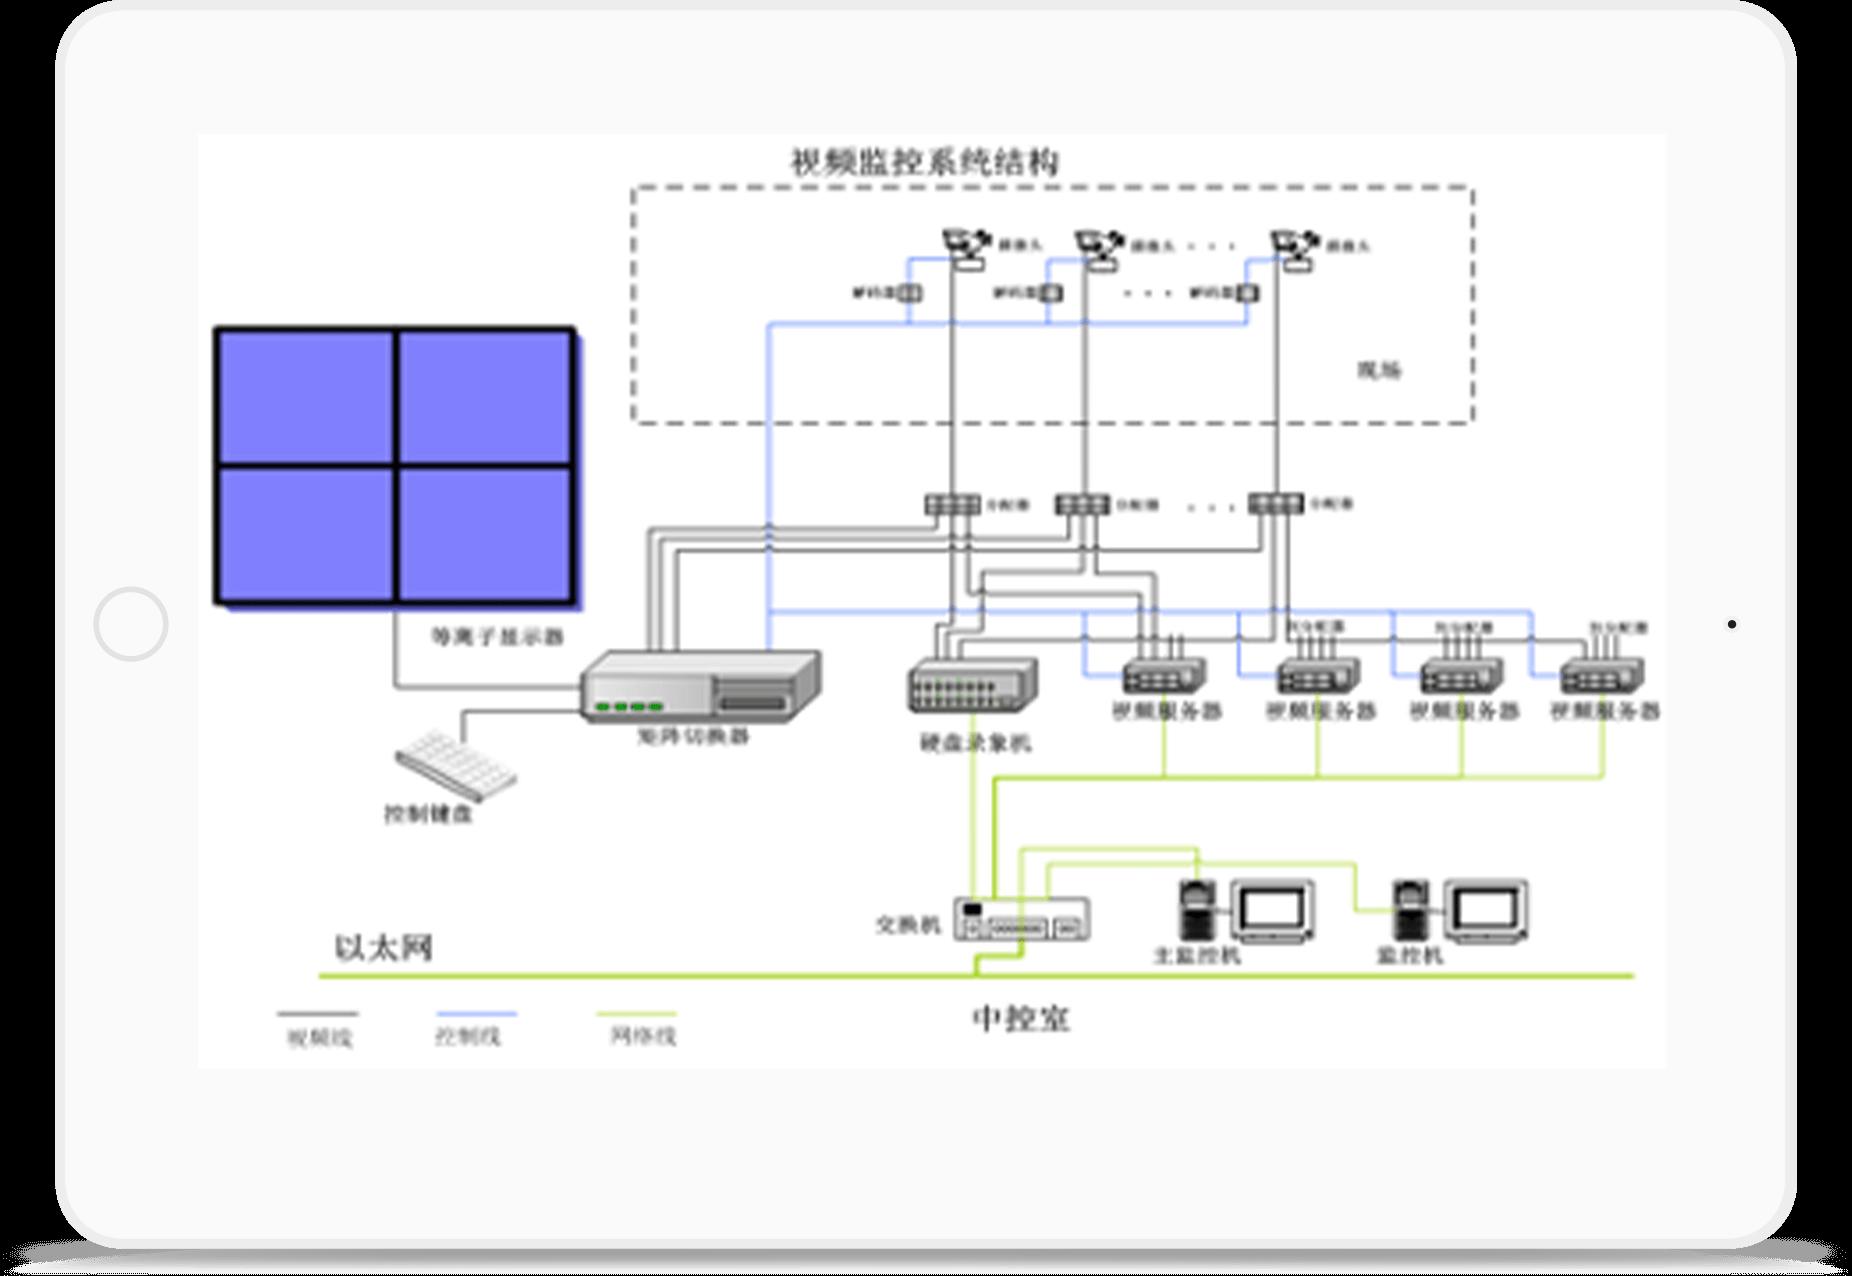 GE HMI/SCADA iFIX uses advanced HMI/SCADA for Beijing Dart